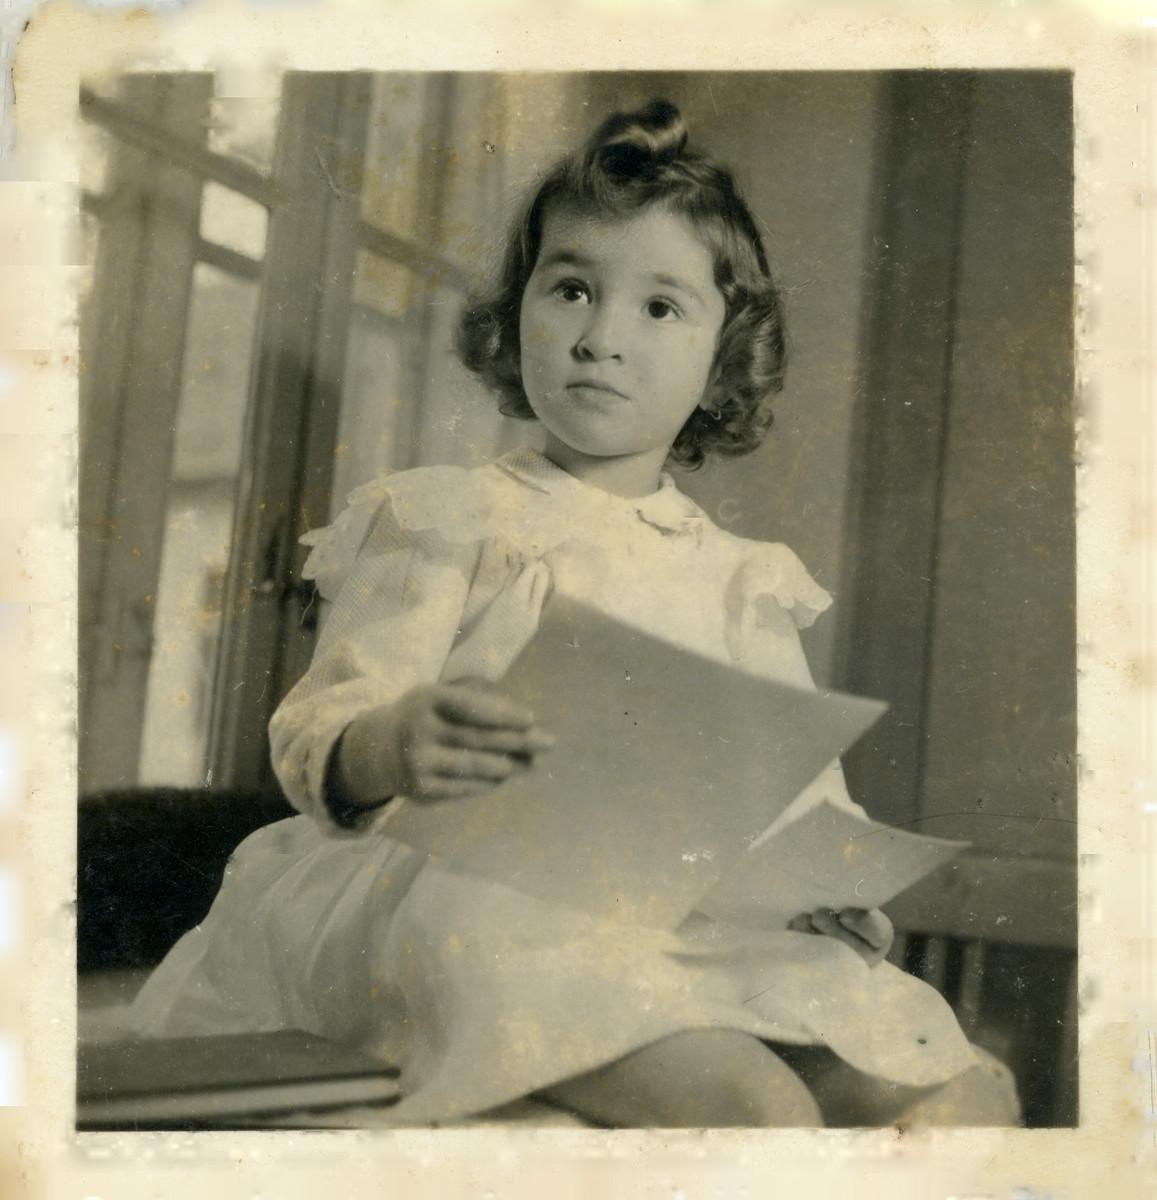 Studio portrait of Goldie Lenji (niece of Lorand Lenji) taken shortly before she was killed in Auschwitz.